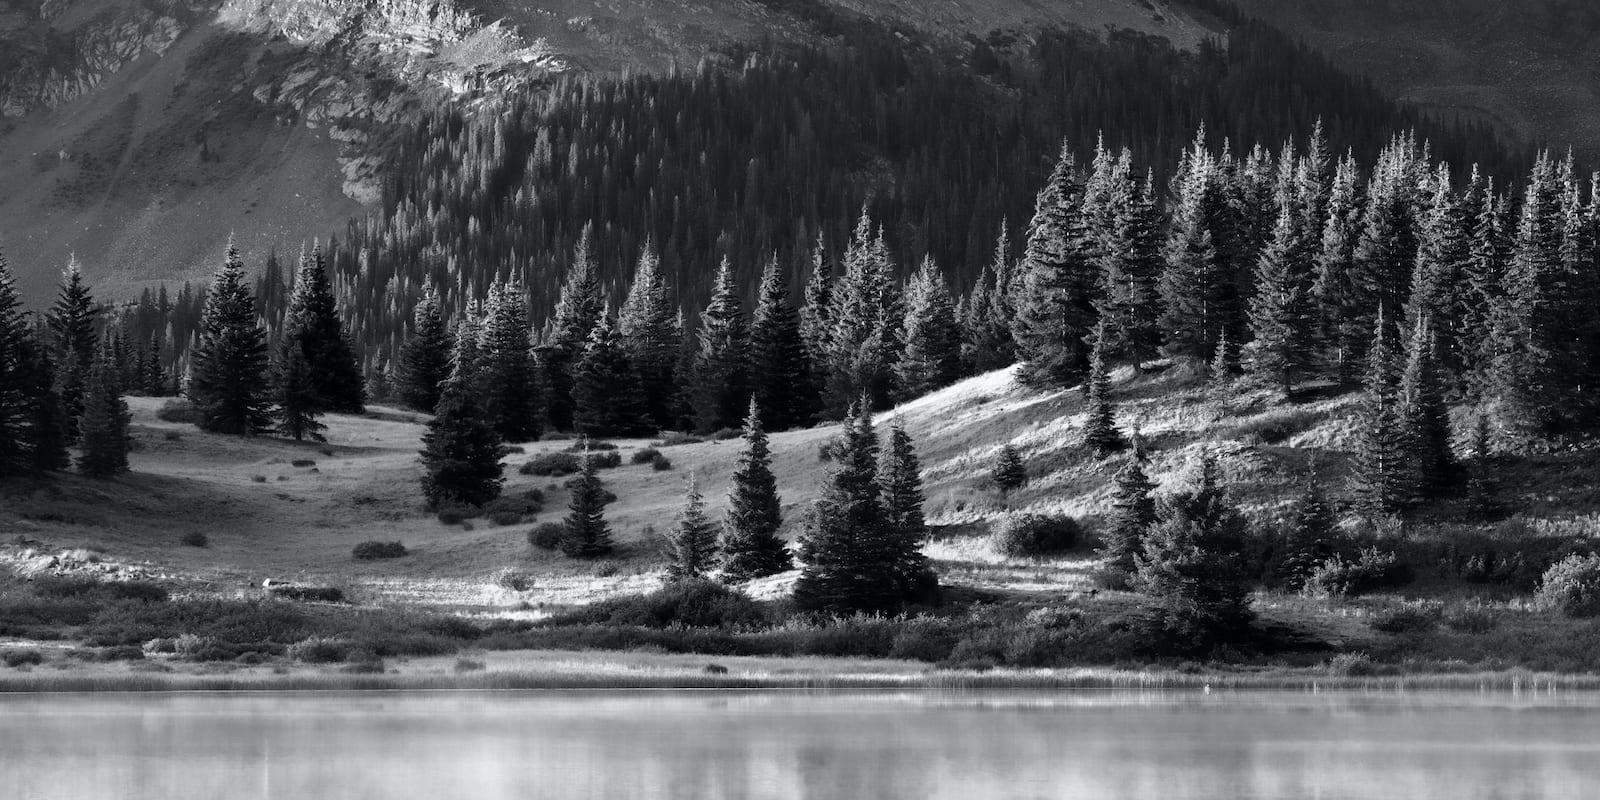 Little Molas Lake Still Black and White Image